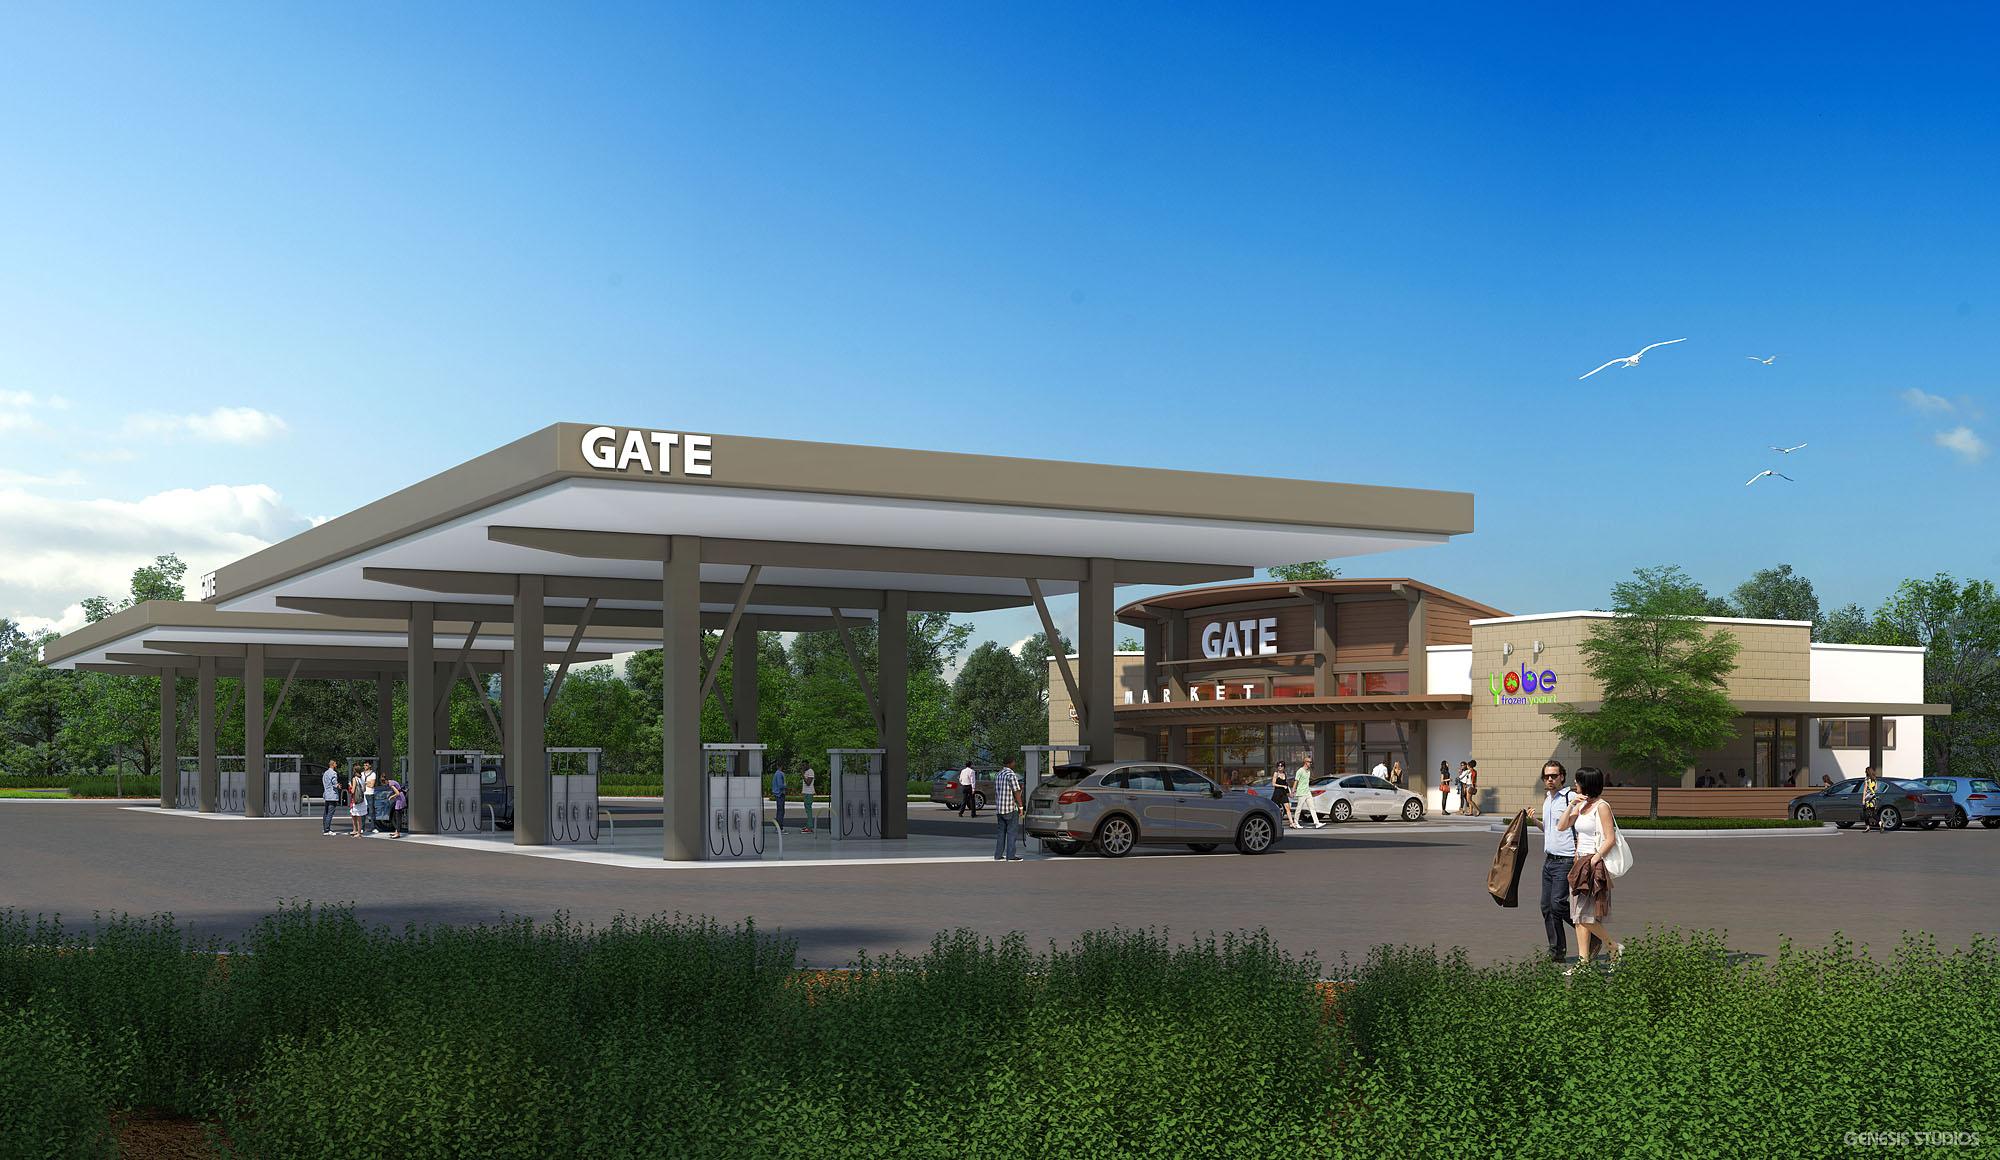 gate gas with yobe.jpg